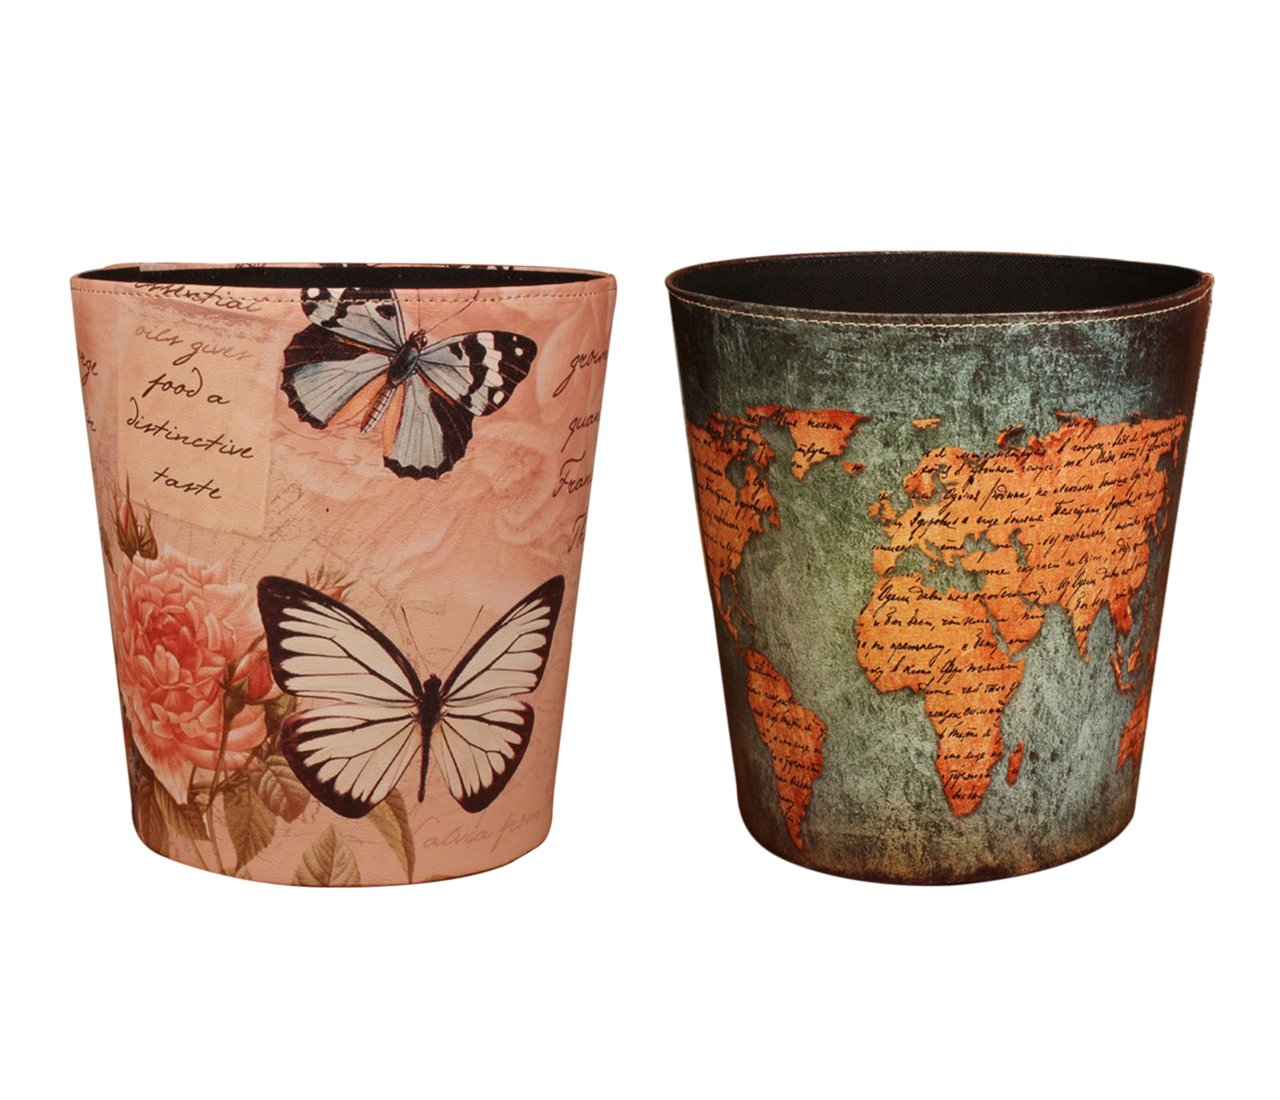 Wastebasket, Yamix European Style Retro PU Leather Wastebasket Paper Basket Trash Can Dustbin Garbage Bin without Lid - World Map Pattern1+ Butterfly and Rose Pattern1